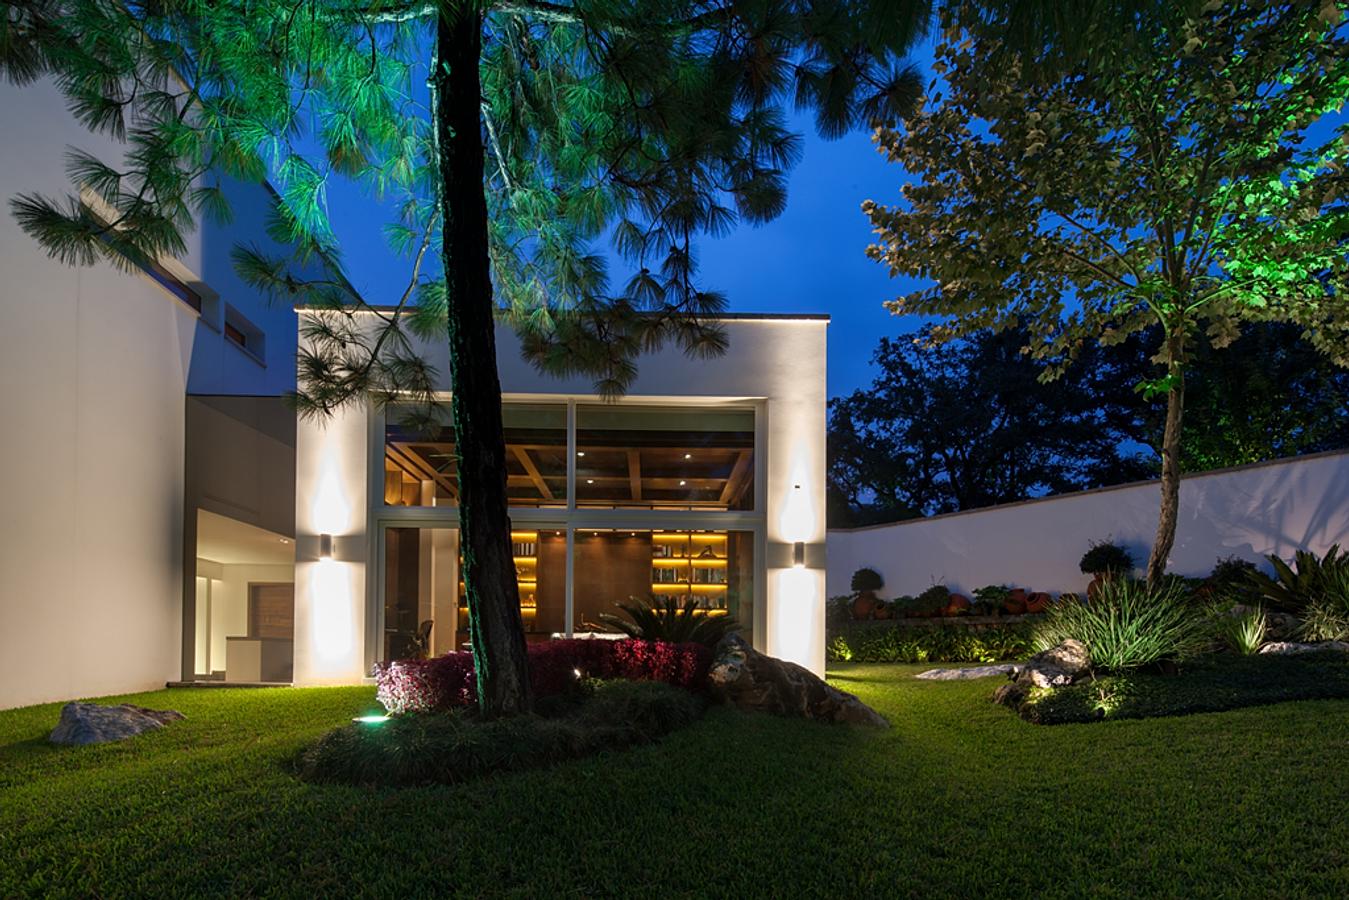 Portico arquitectura y construcci n for Piccola casa con avvolgente portico